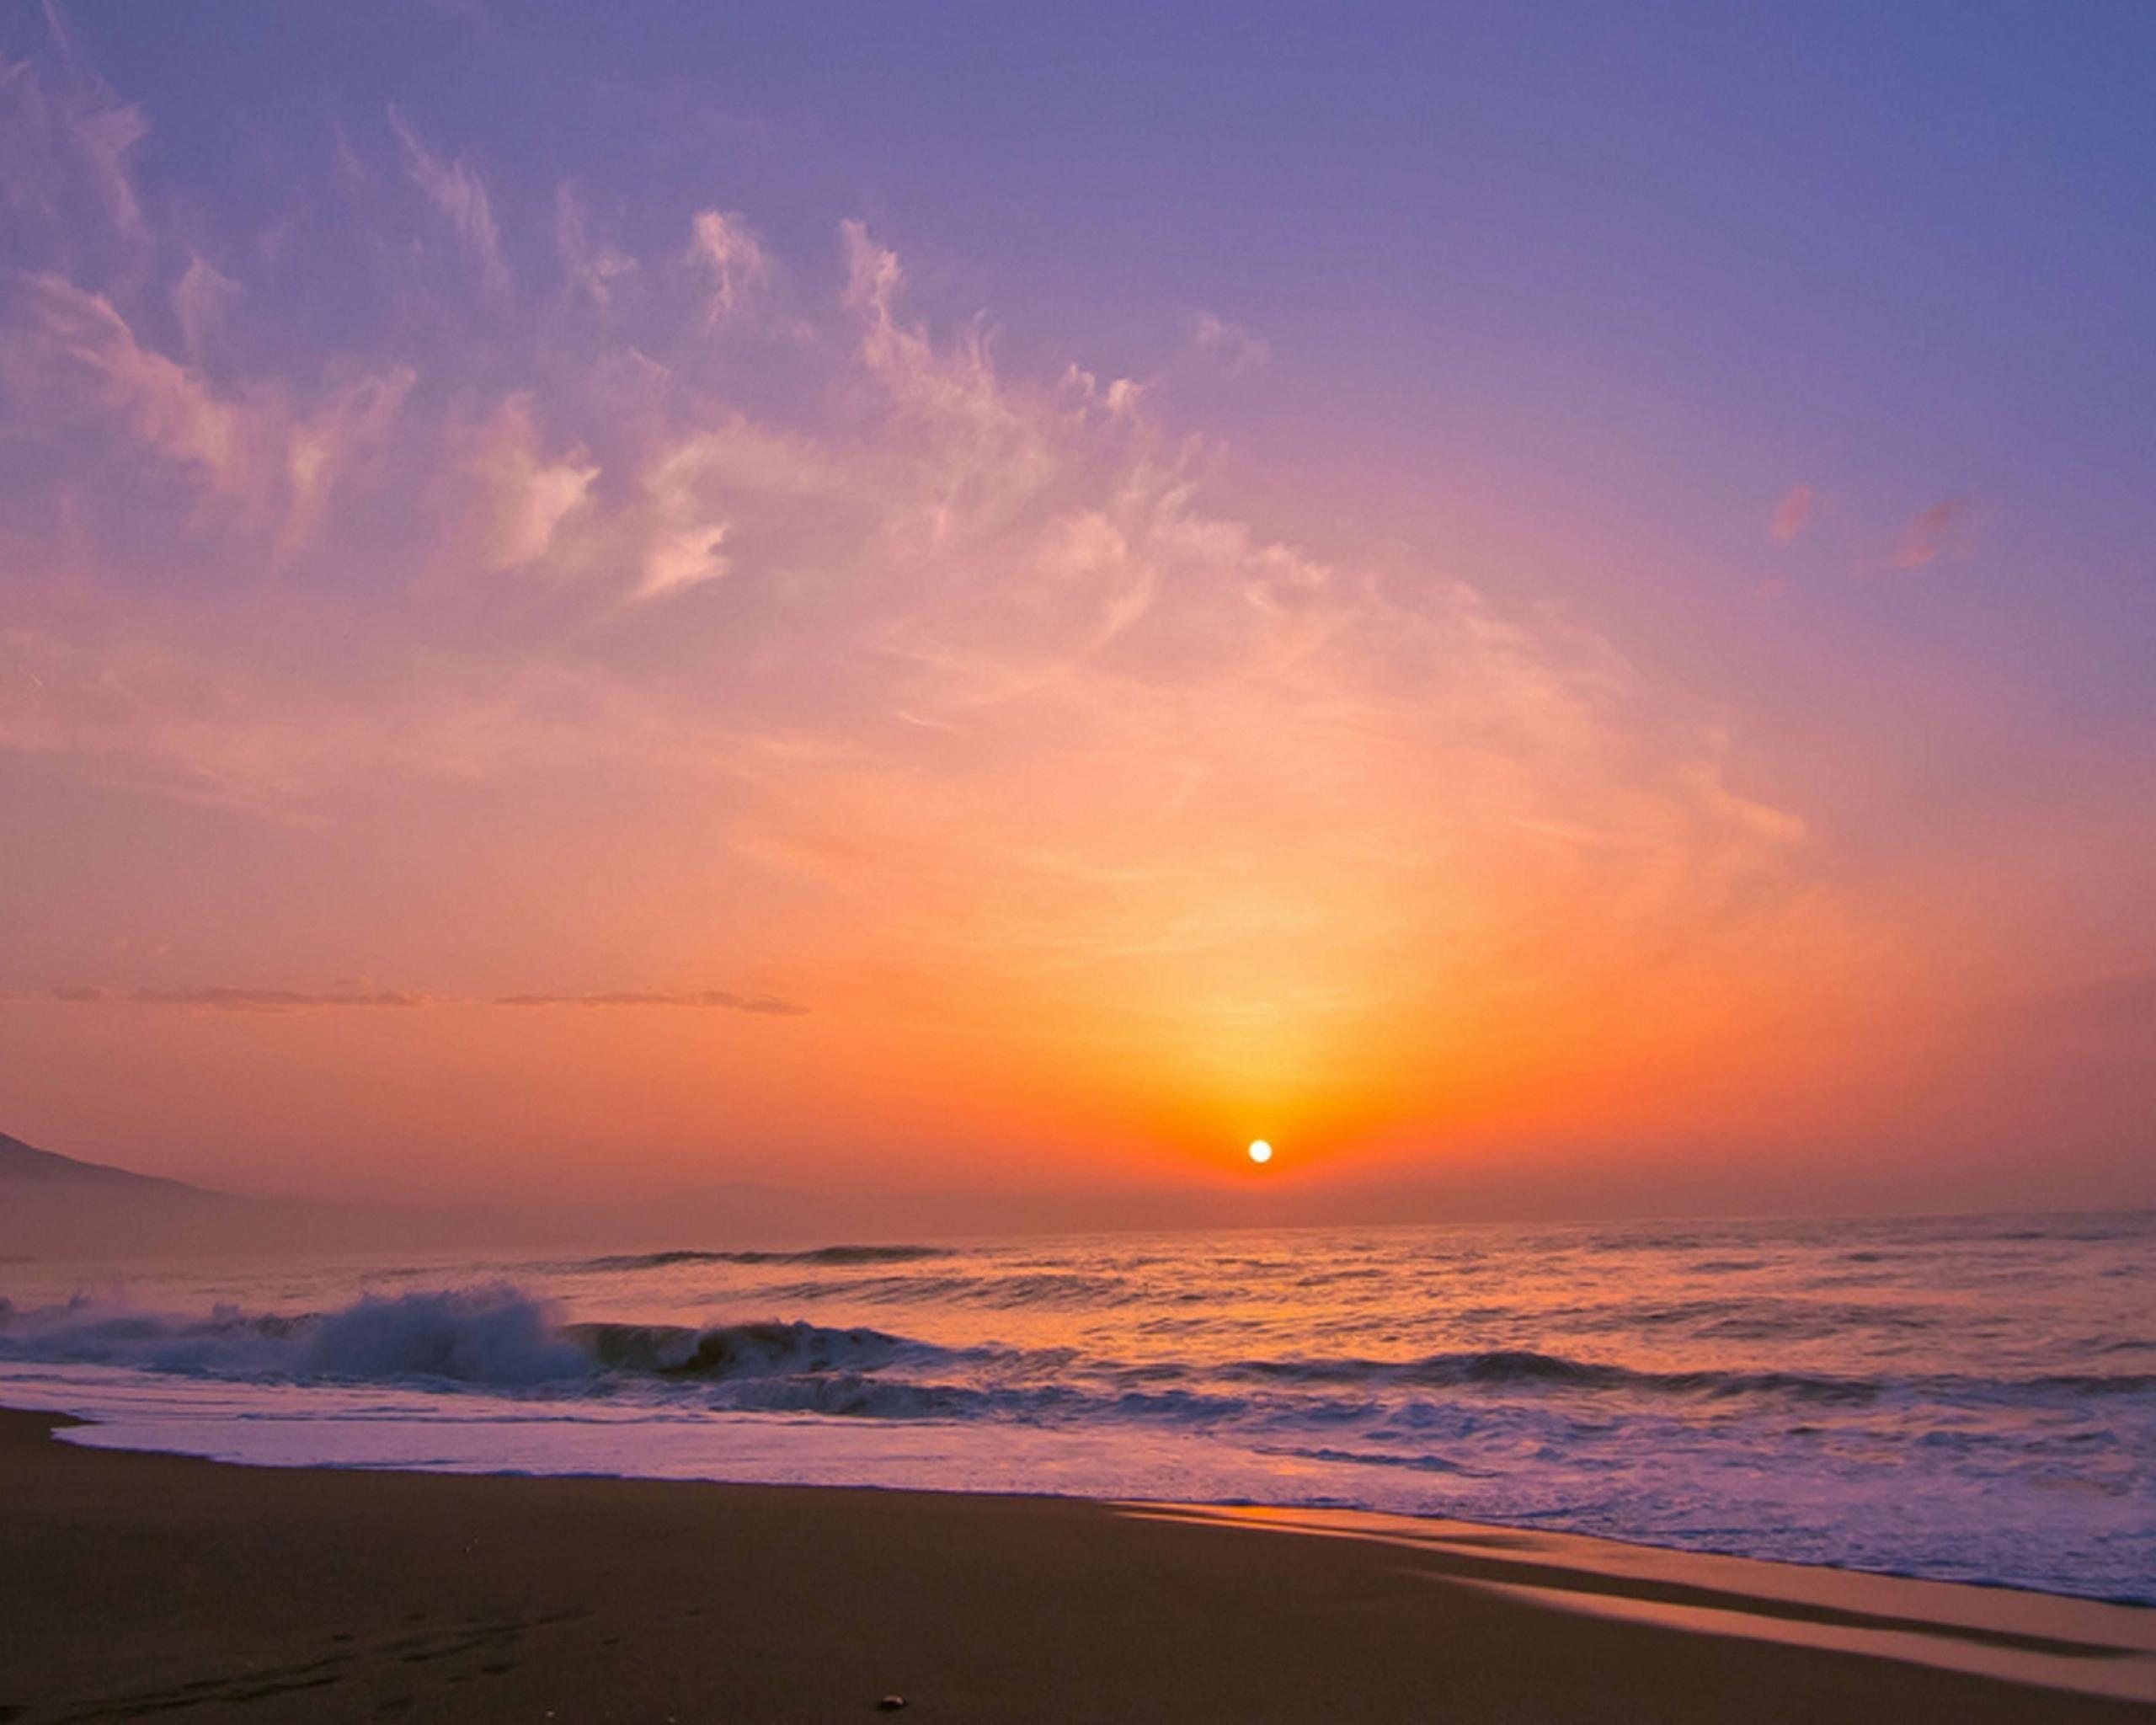 Px Sunset Wallpaper Desktop Nexus By Honey Waite